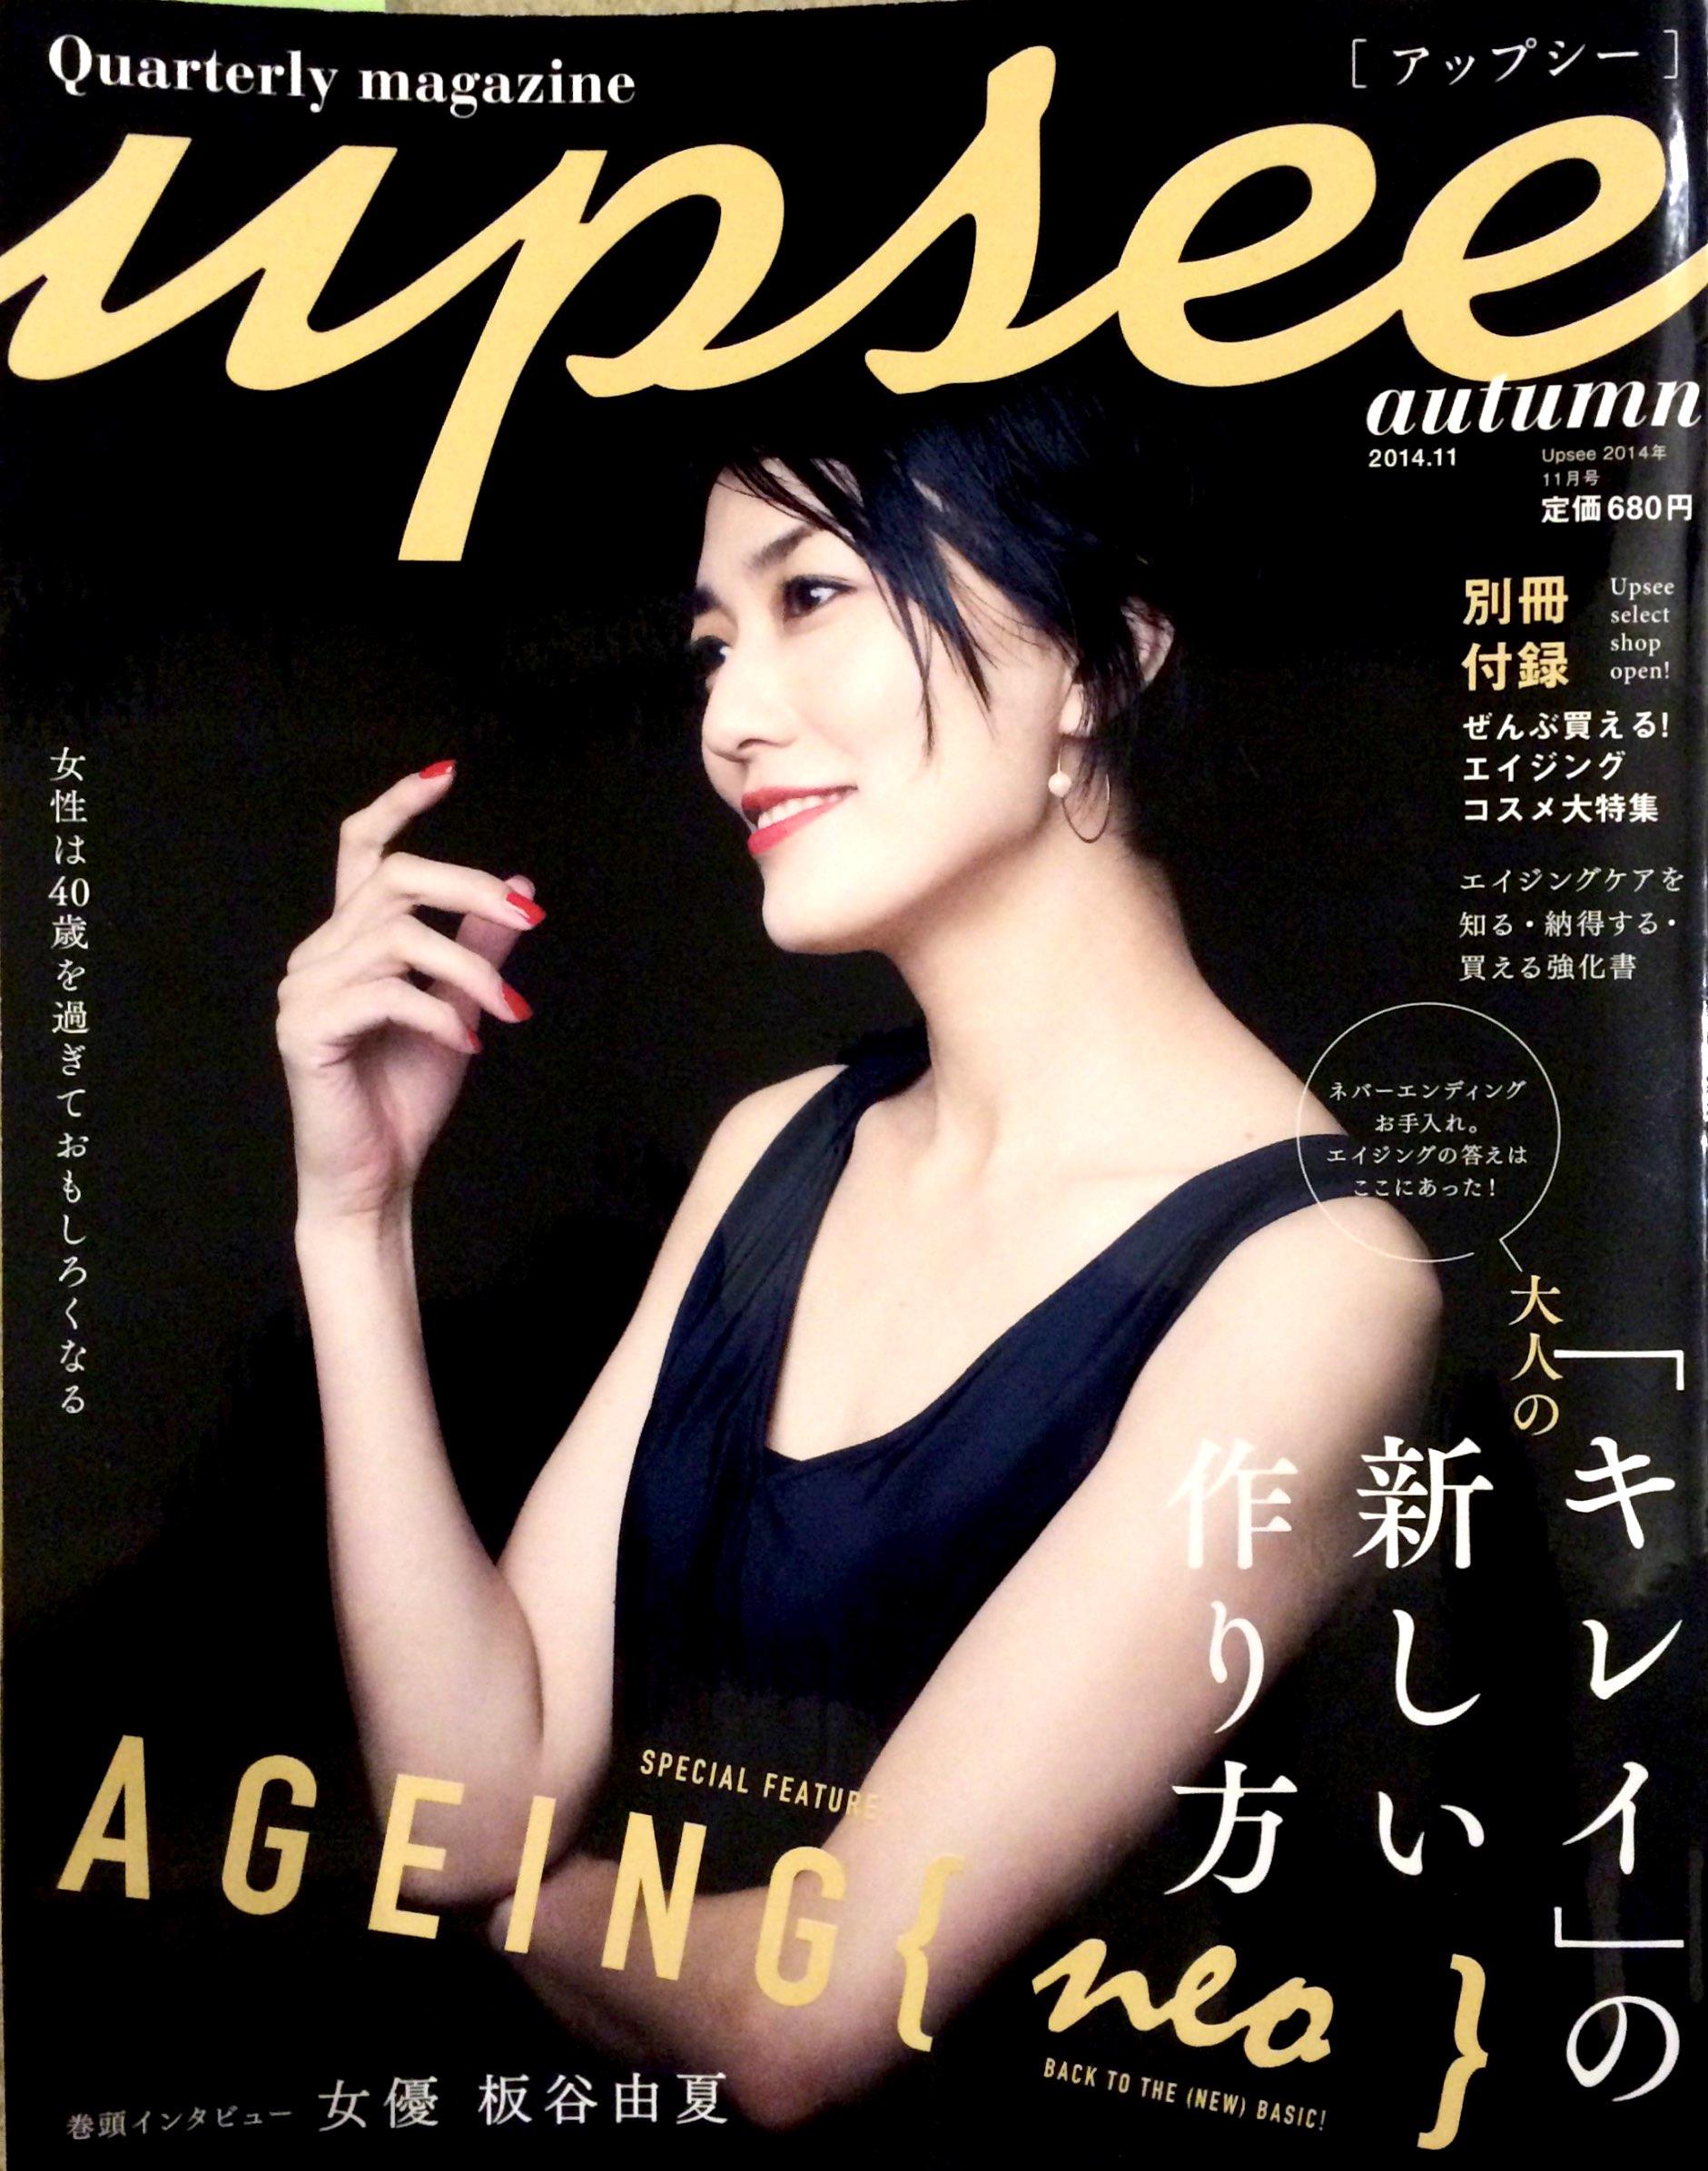 Upsee 2014年11月号に小顔製作所が掲載されました。